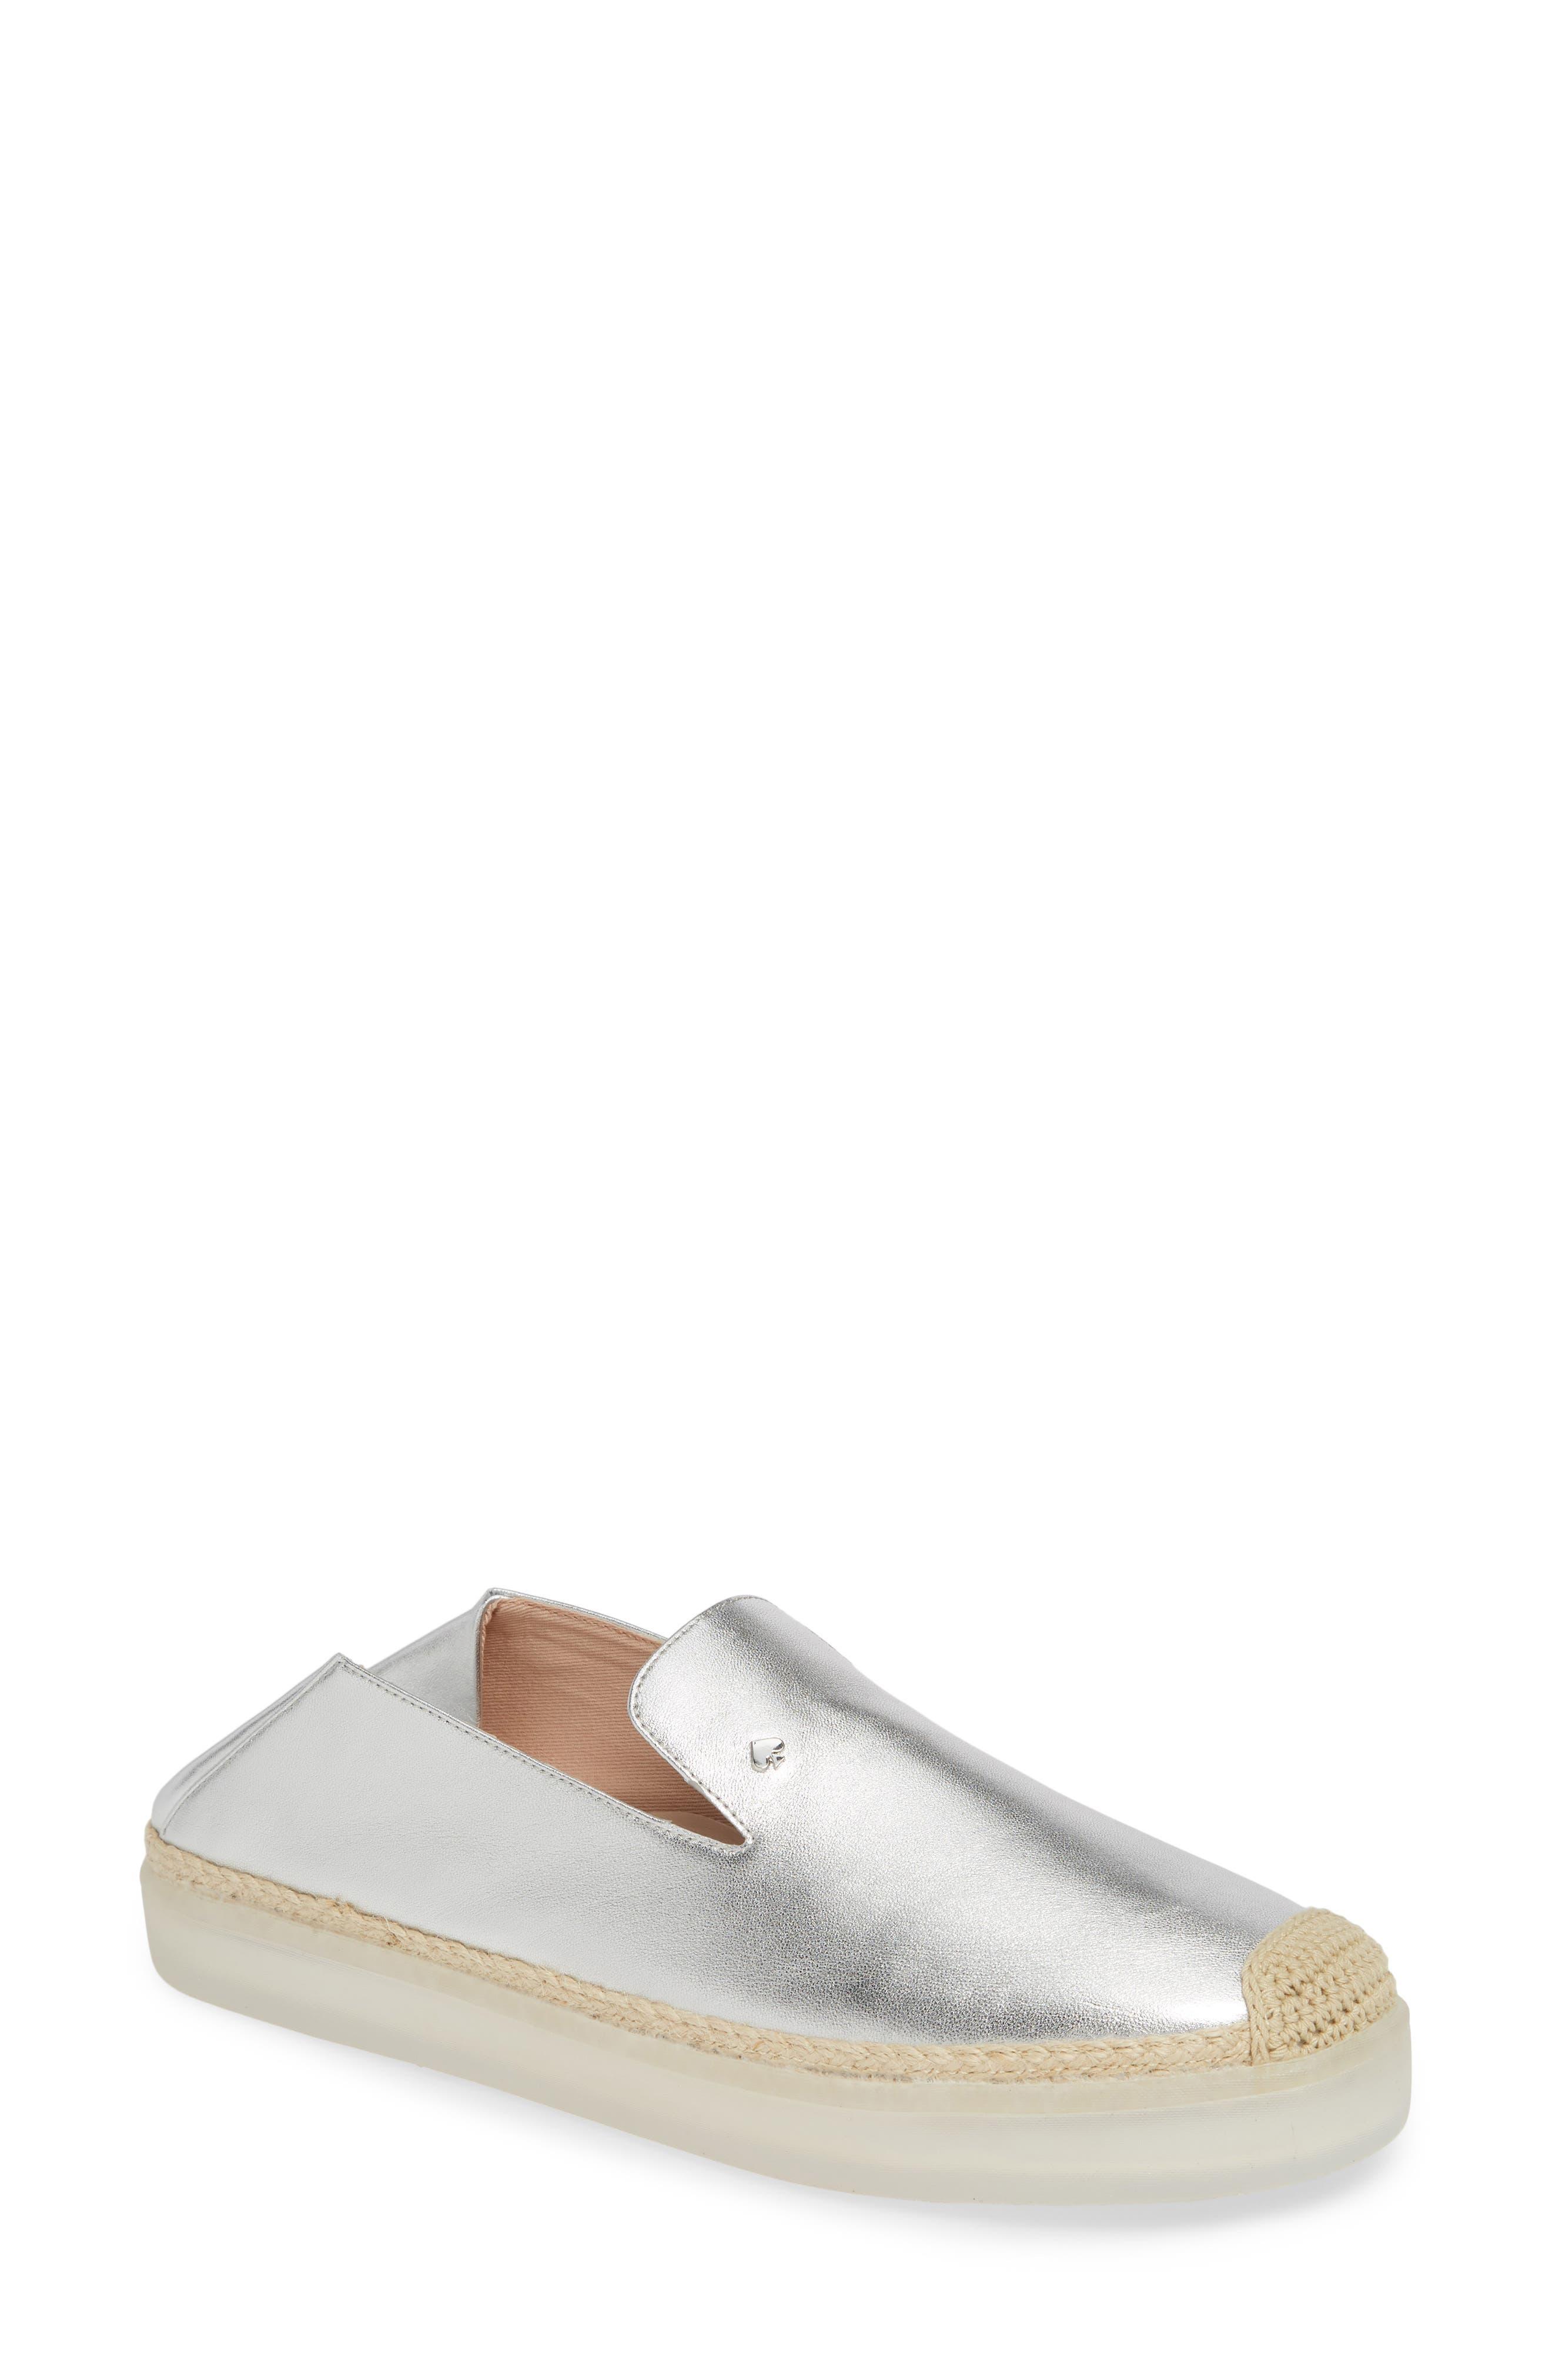 lisa slip-on sneaker,                             Main thumbnail 1, color,                             SILVER